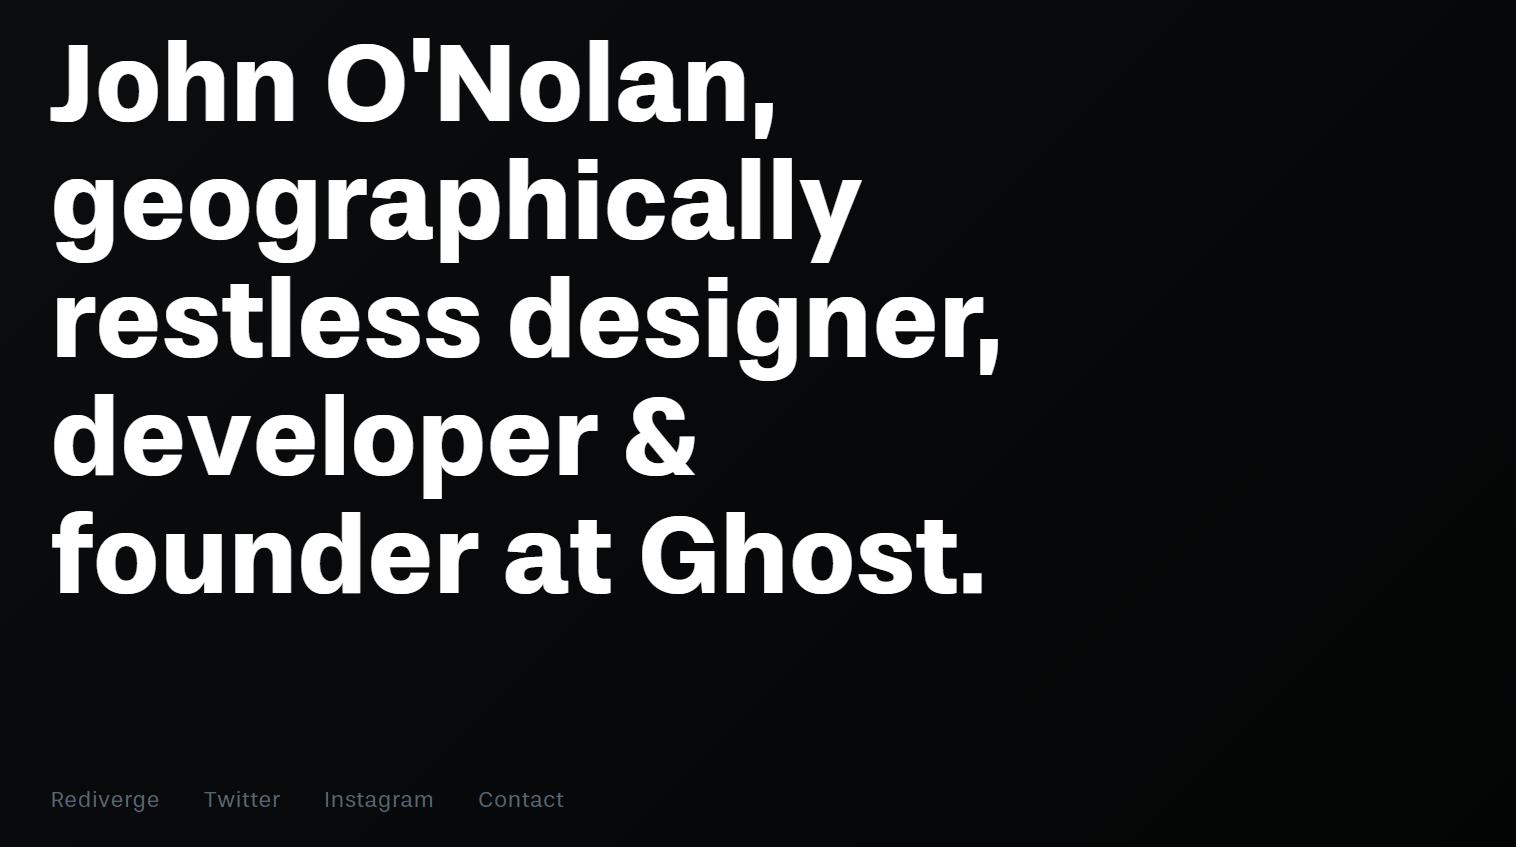 John O'Nolan's website homepage